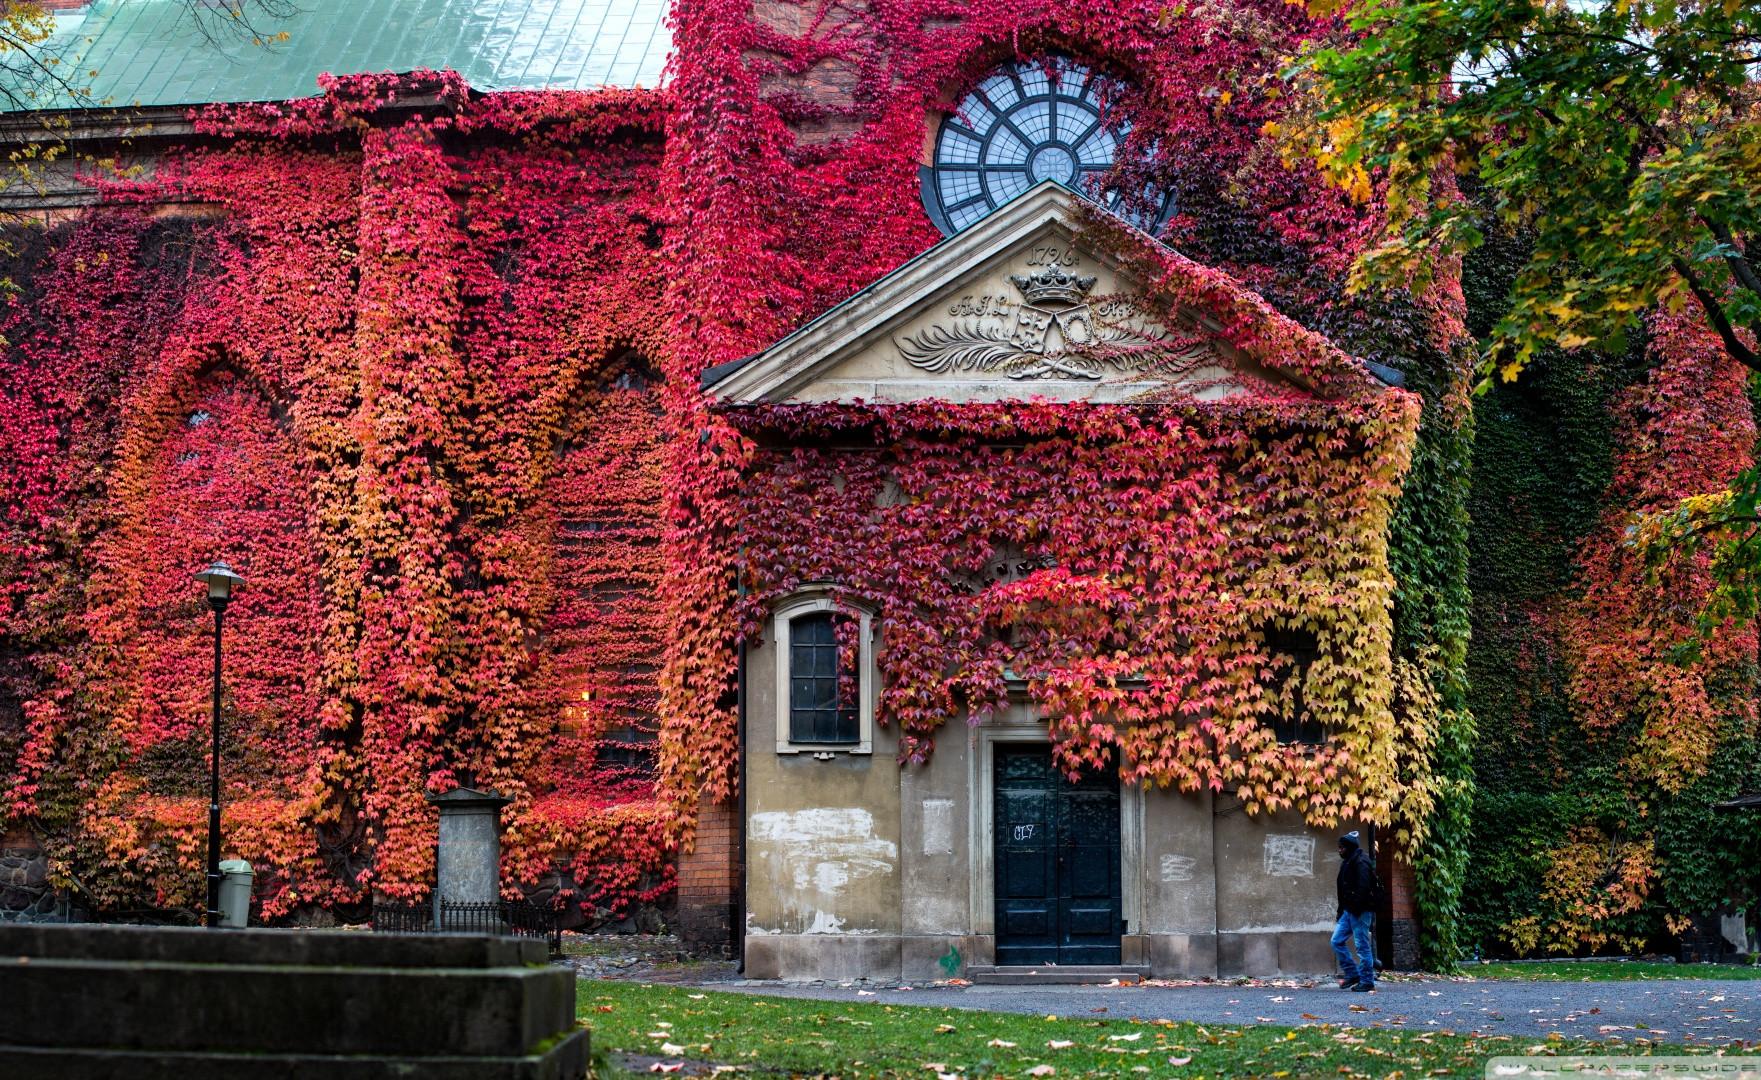 Stockholm Klara Church